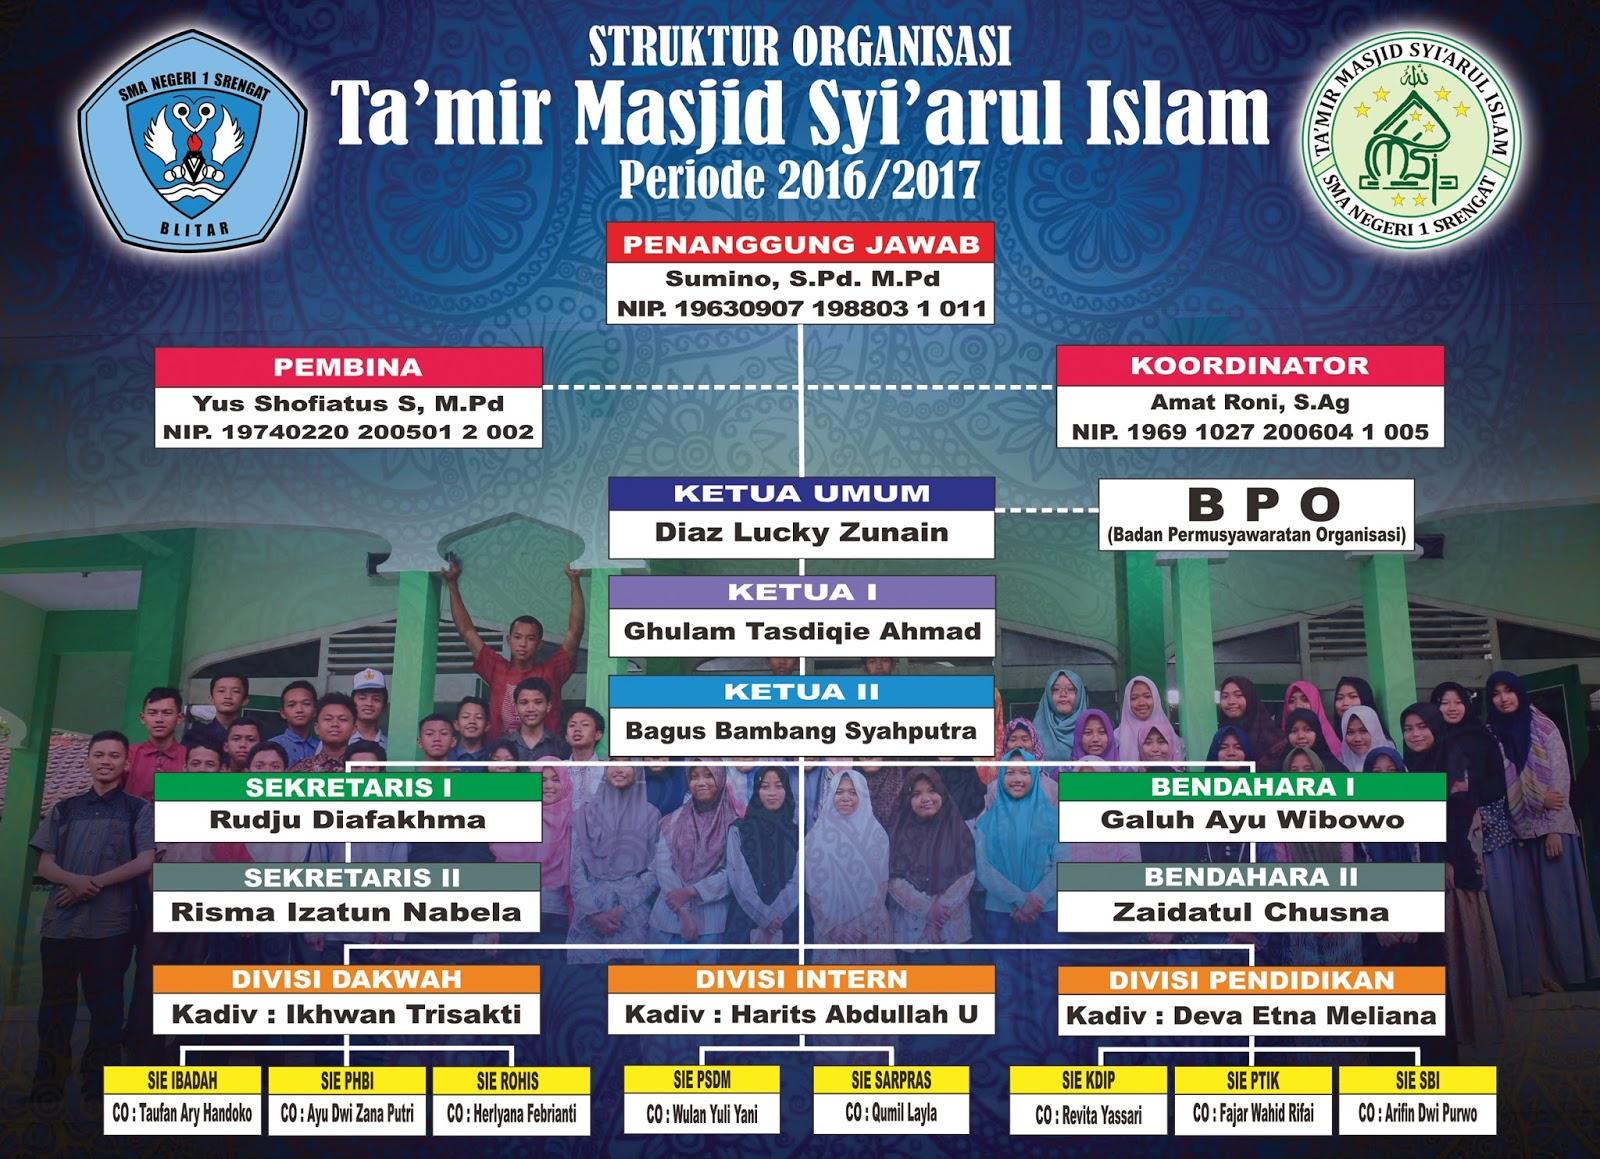 Struktur Organisasi TMSI 2016/2017